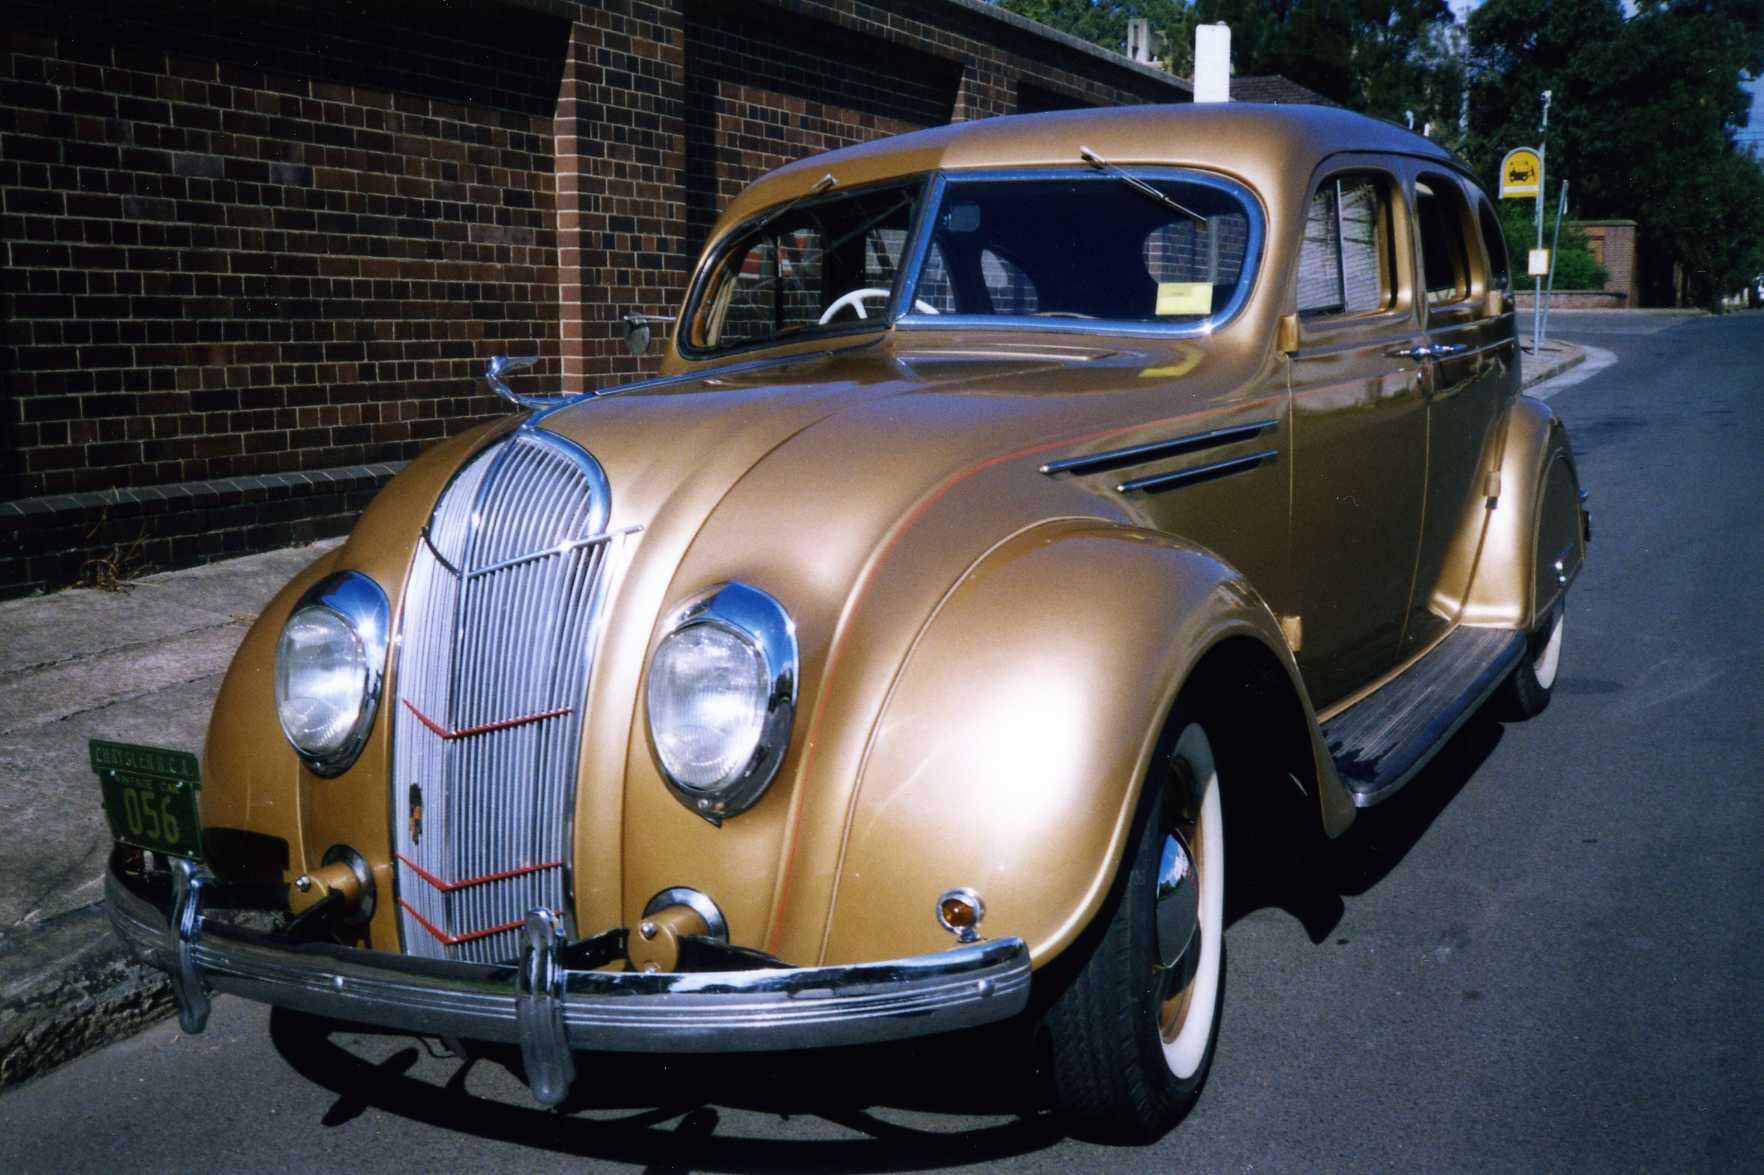 1935 SG Desoto RHD Sedan